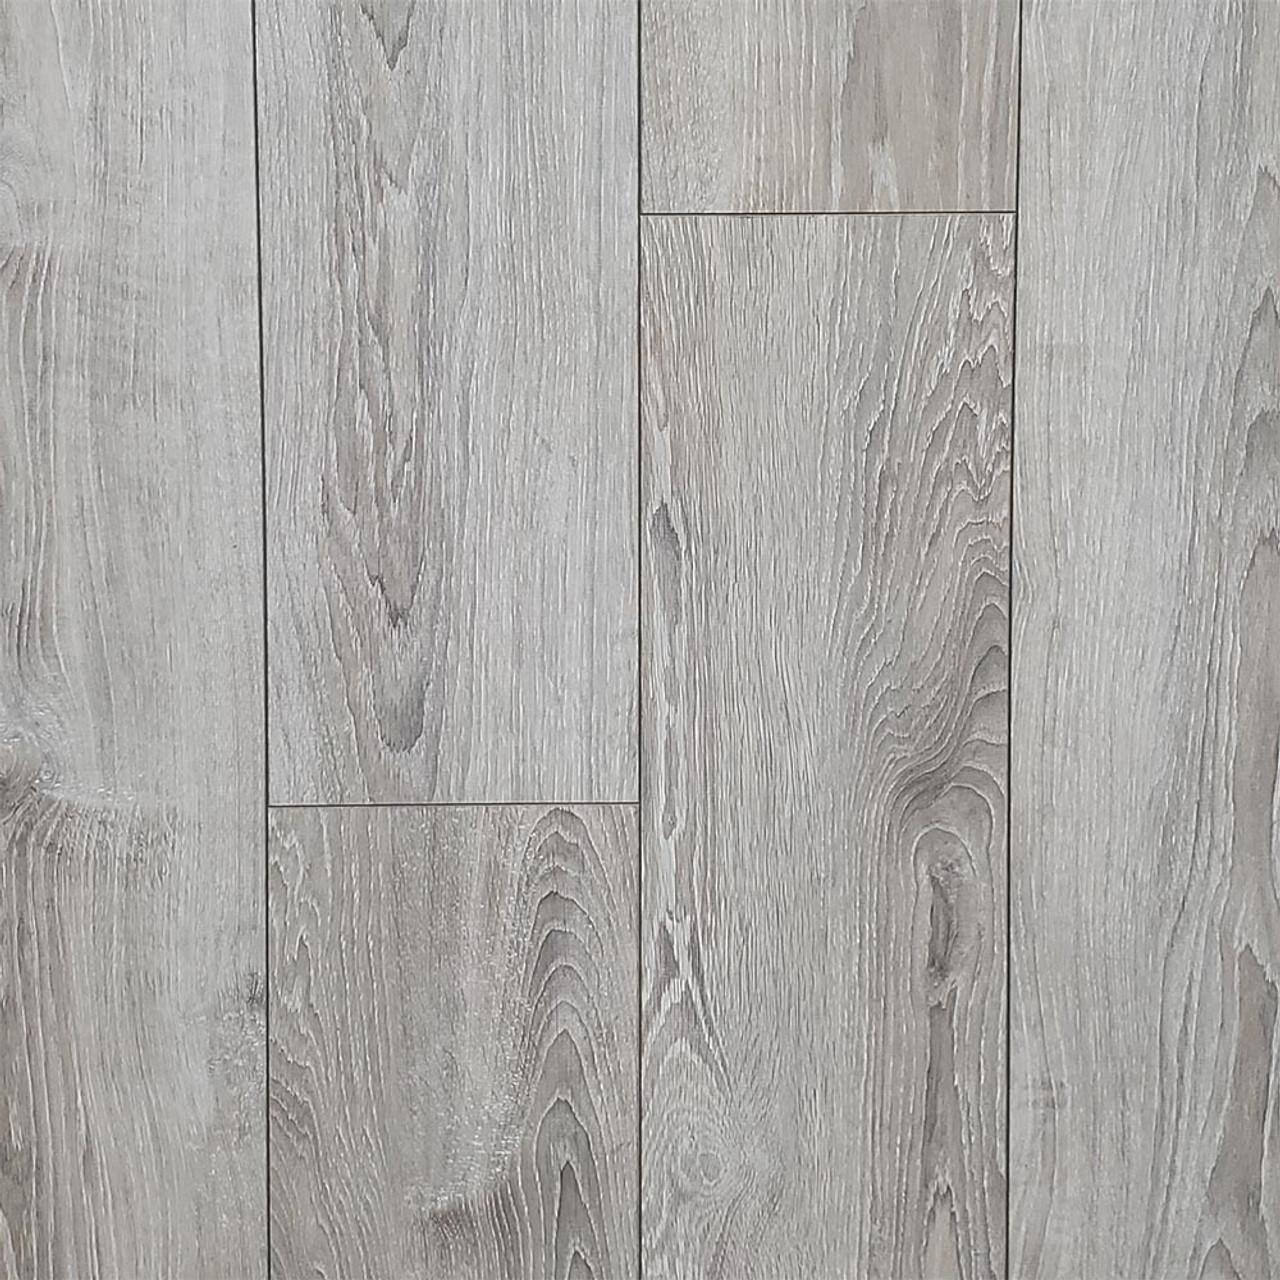 12mm Sardinia Laminate Flooring   17.76 Sq.Ft. Per Box   Sold by the Box